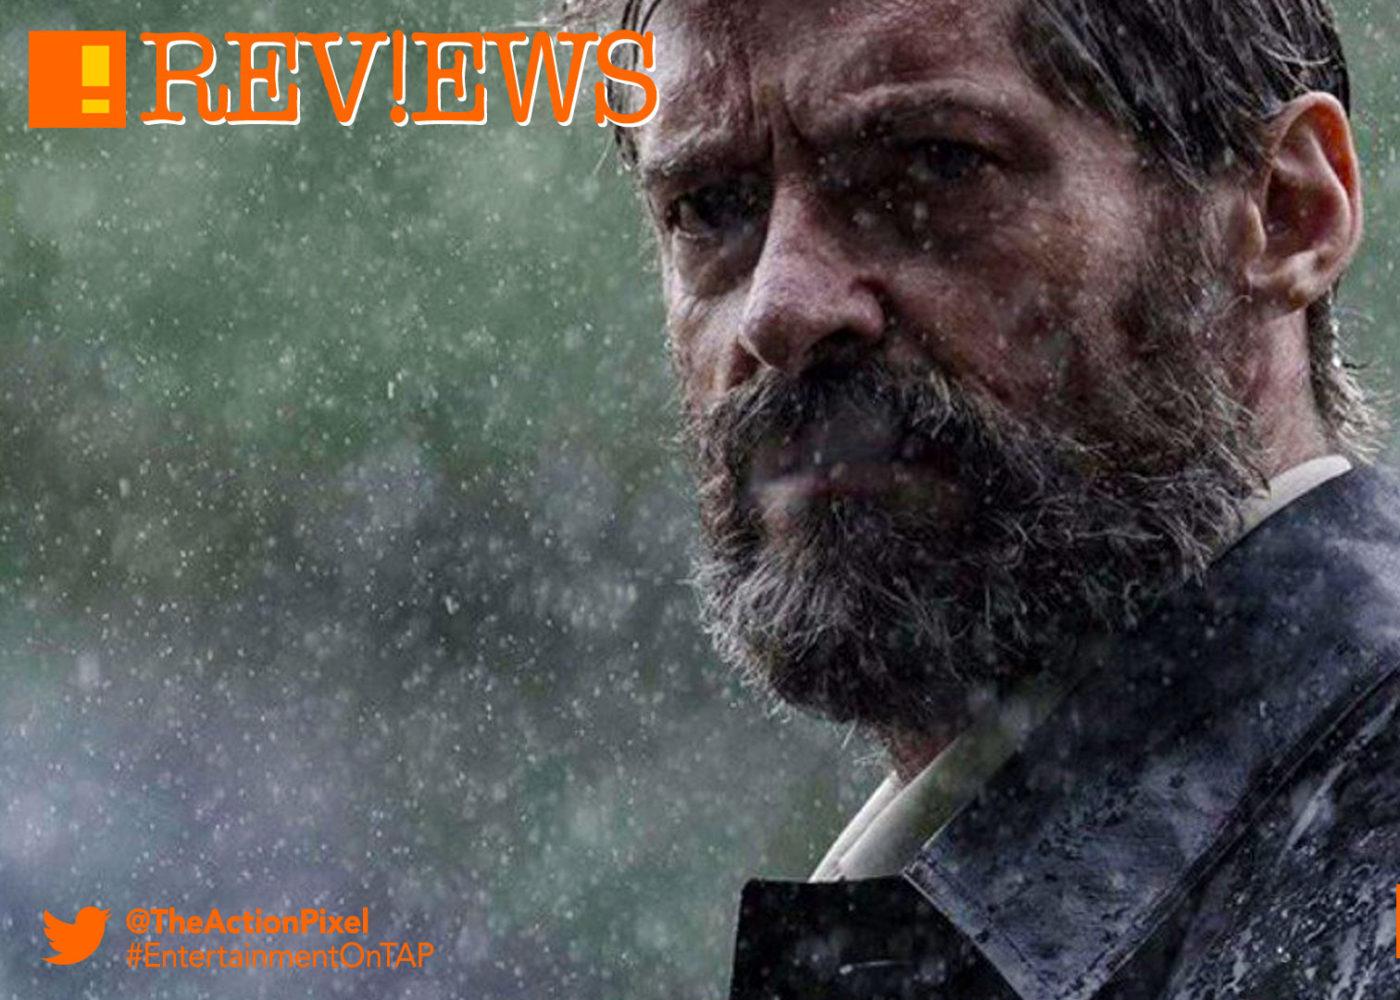 dafne keen, x-23, the action pixel, x-men, wolverine, logan, 20th century fox, marvel, hugh jackman, dafne keen, tap reviews, #tapreviews, review, rating, movie review